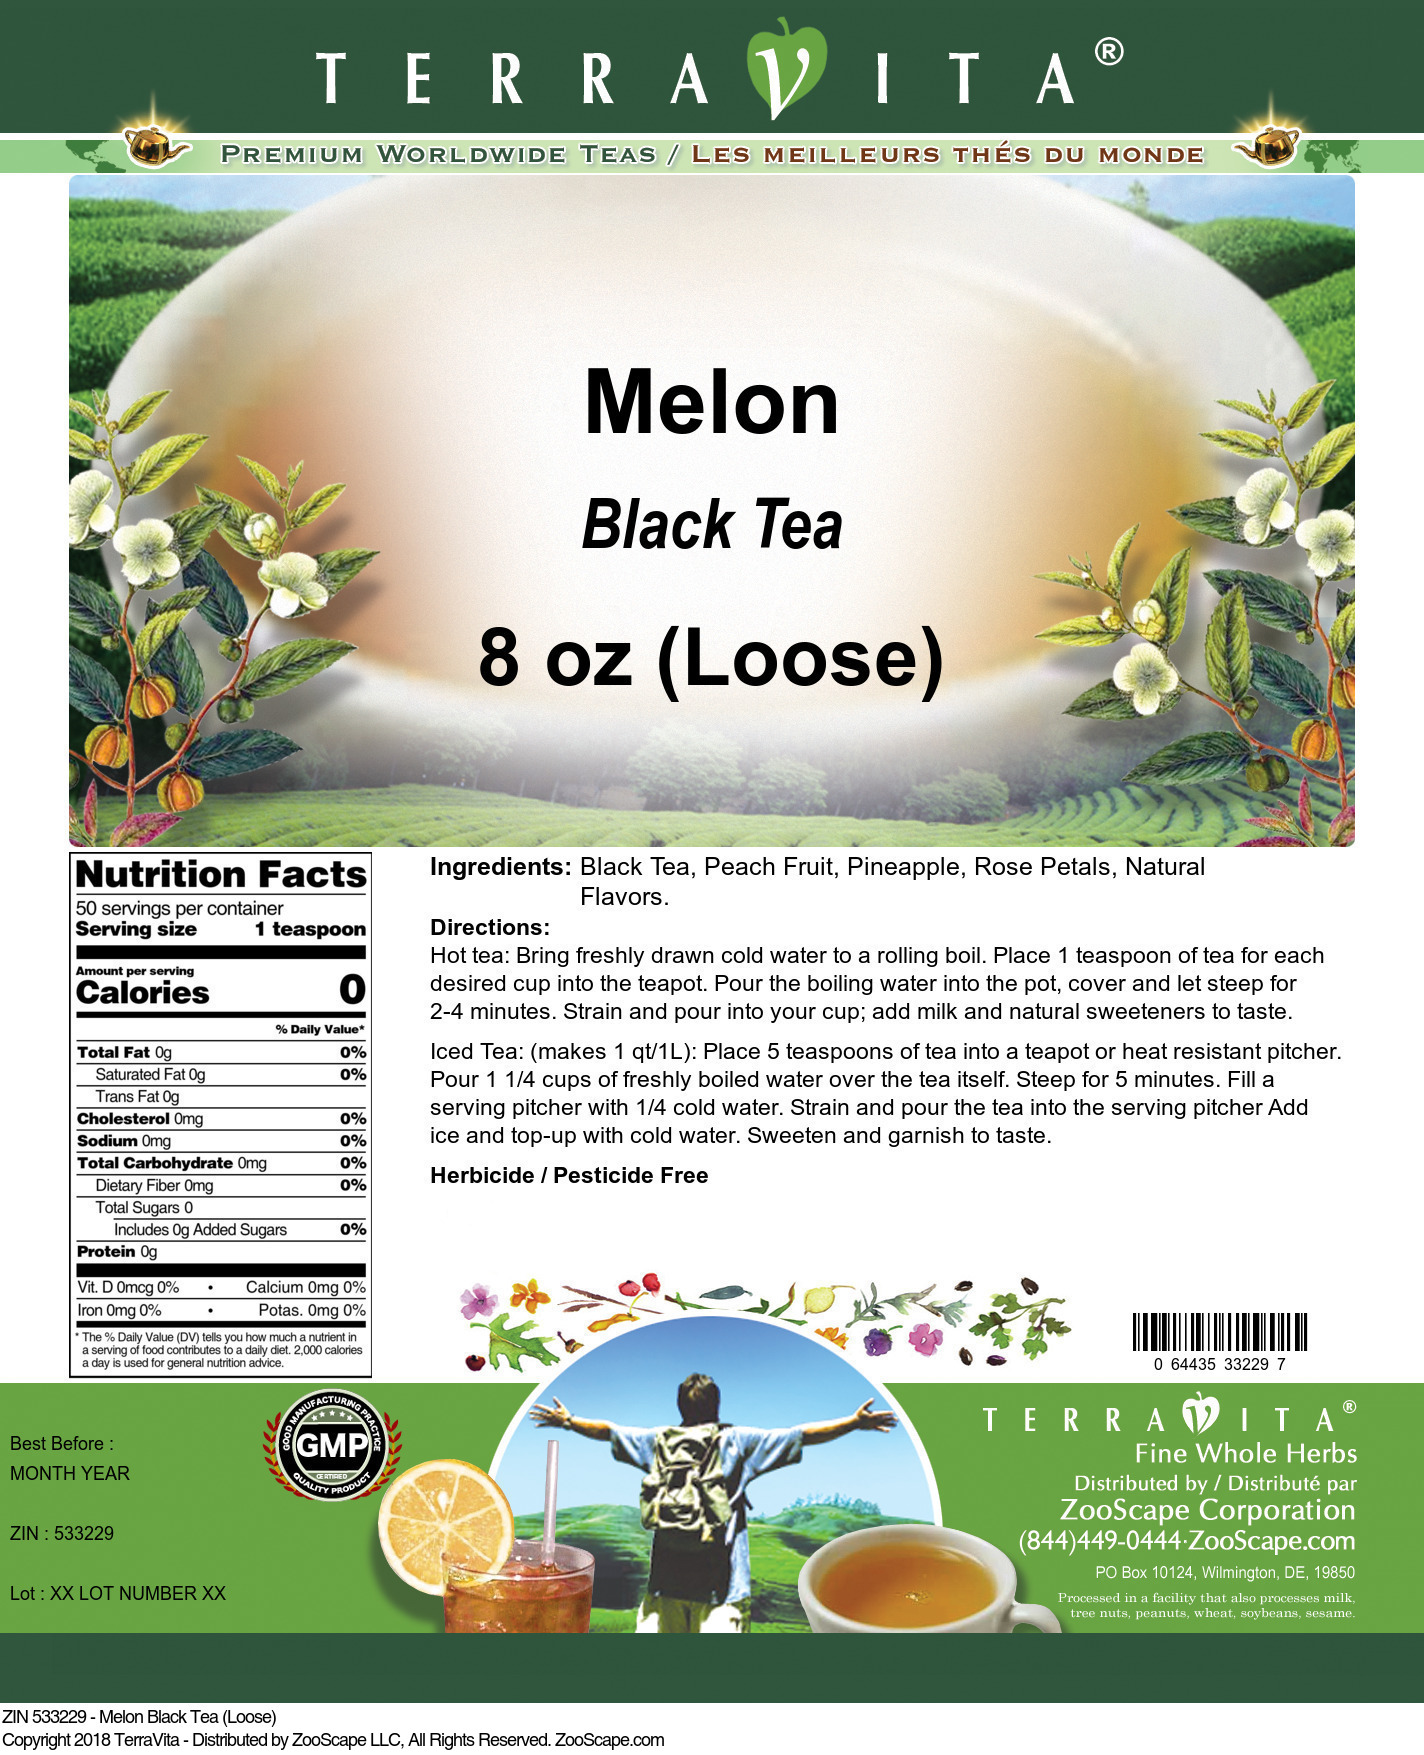 Melon Black Tea (Loose)